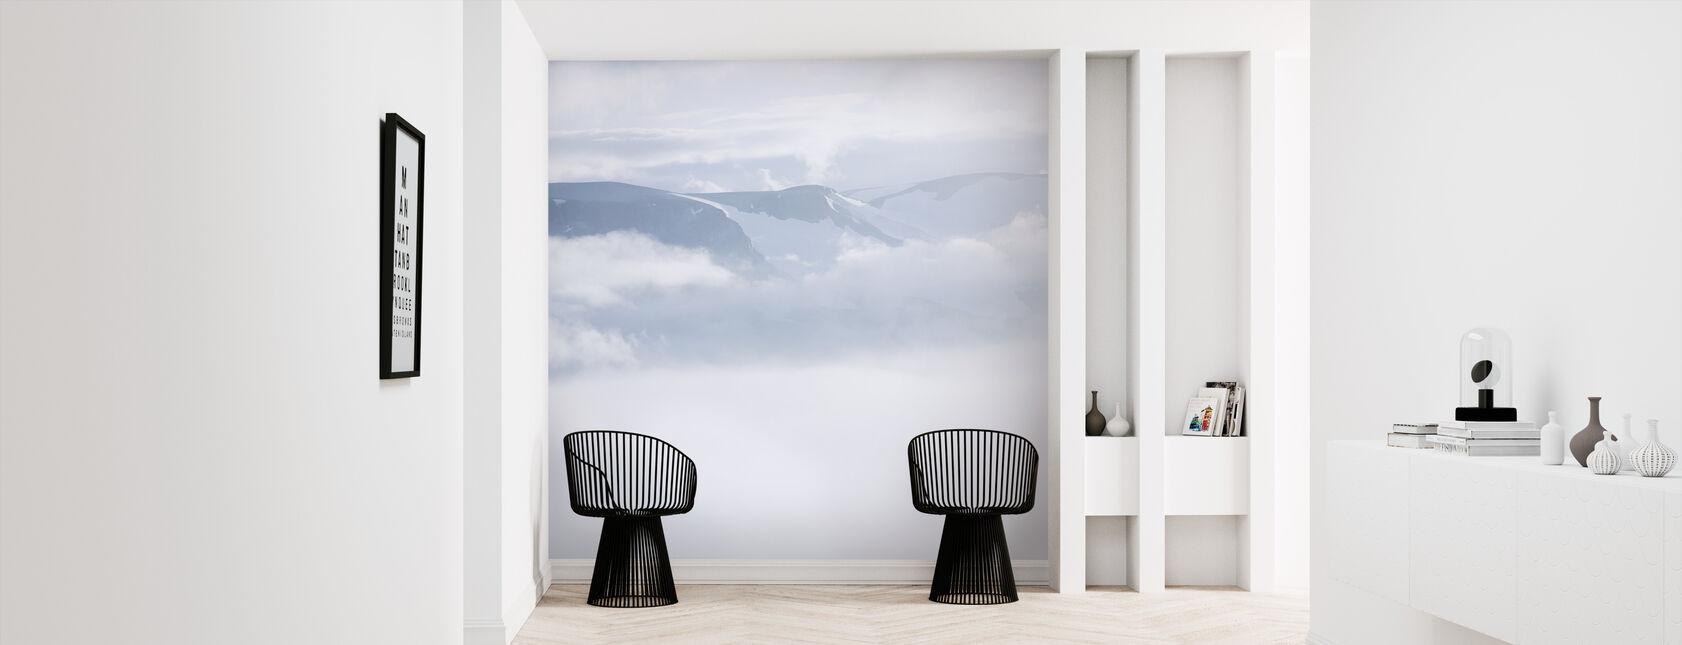 Dalsnibba Geiranger - Wallpaper - Hallway